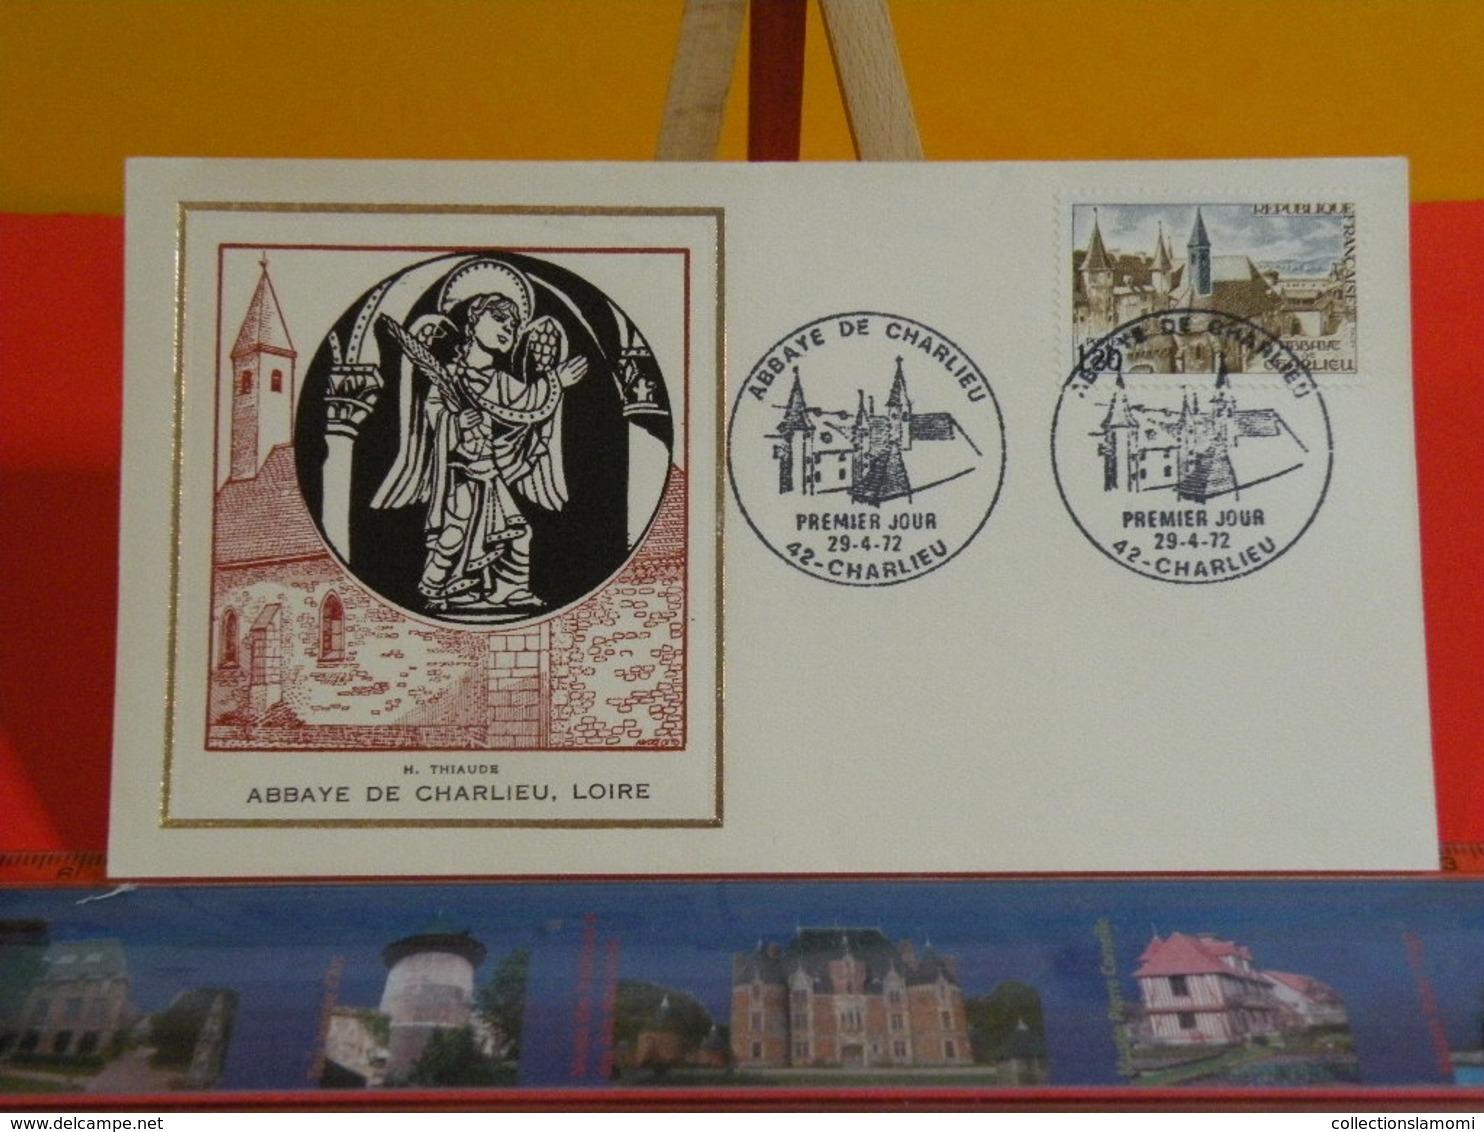 FDC Luxe > Abbaye De Charlieu, Loire (H. Thiaude)> (42) Charlieu < 29.4.1972 > 1er Jour - FDC